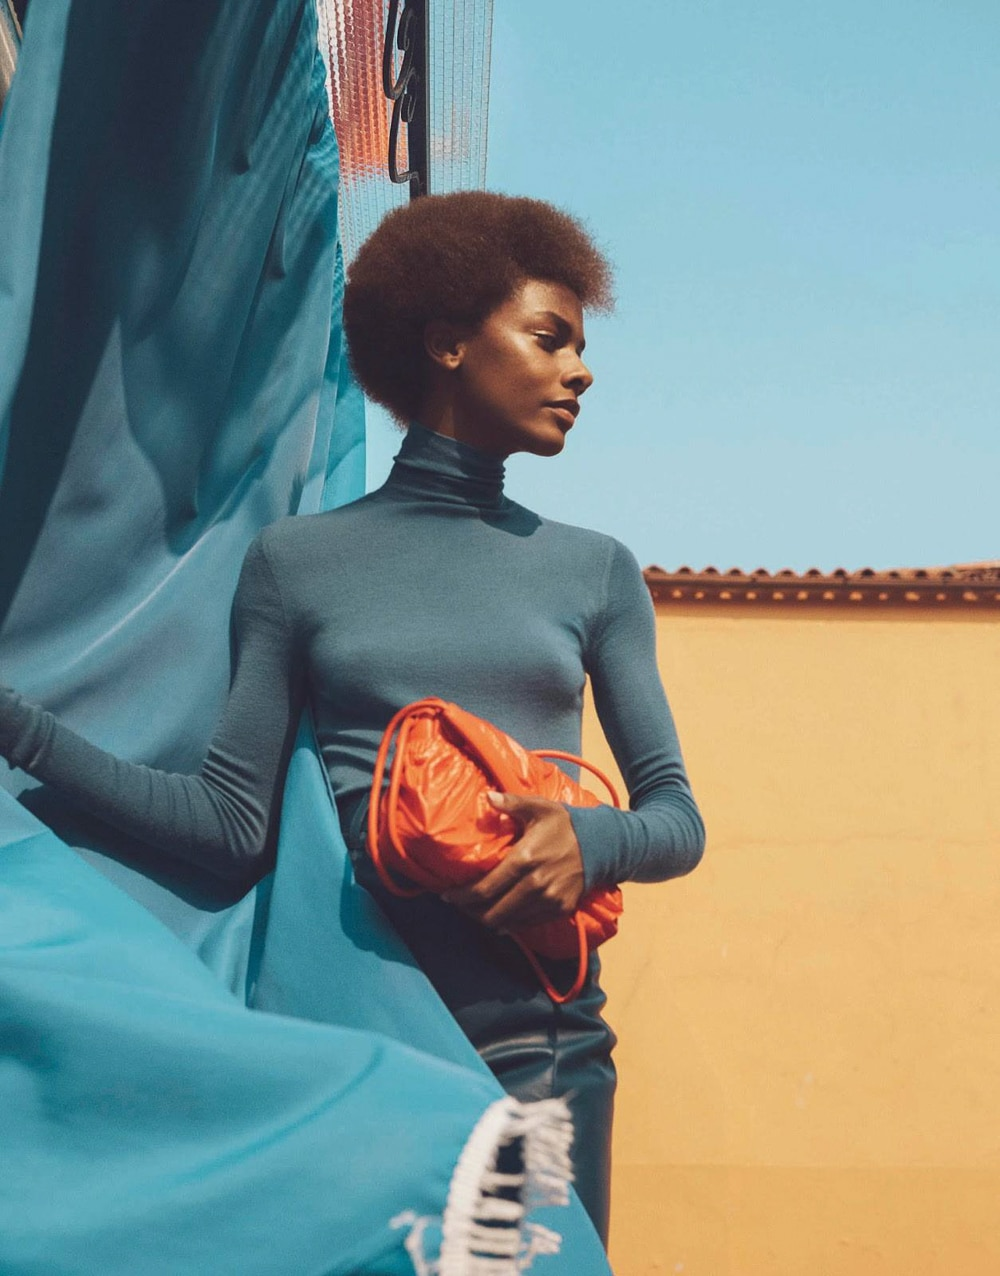 Porter-Magazine-Fall-2017-Karly-Loyce-by-Emma-Tempest-1.jpg